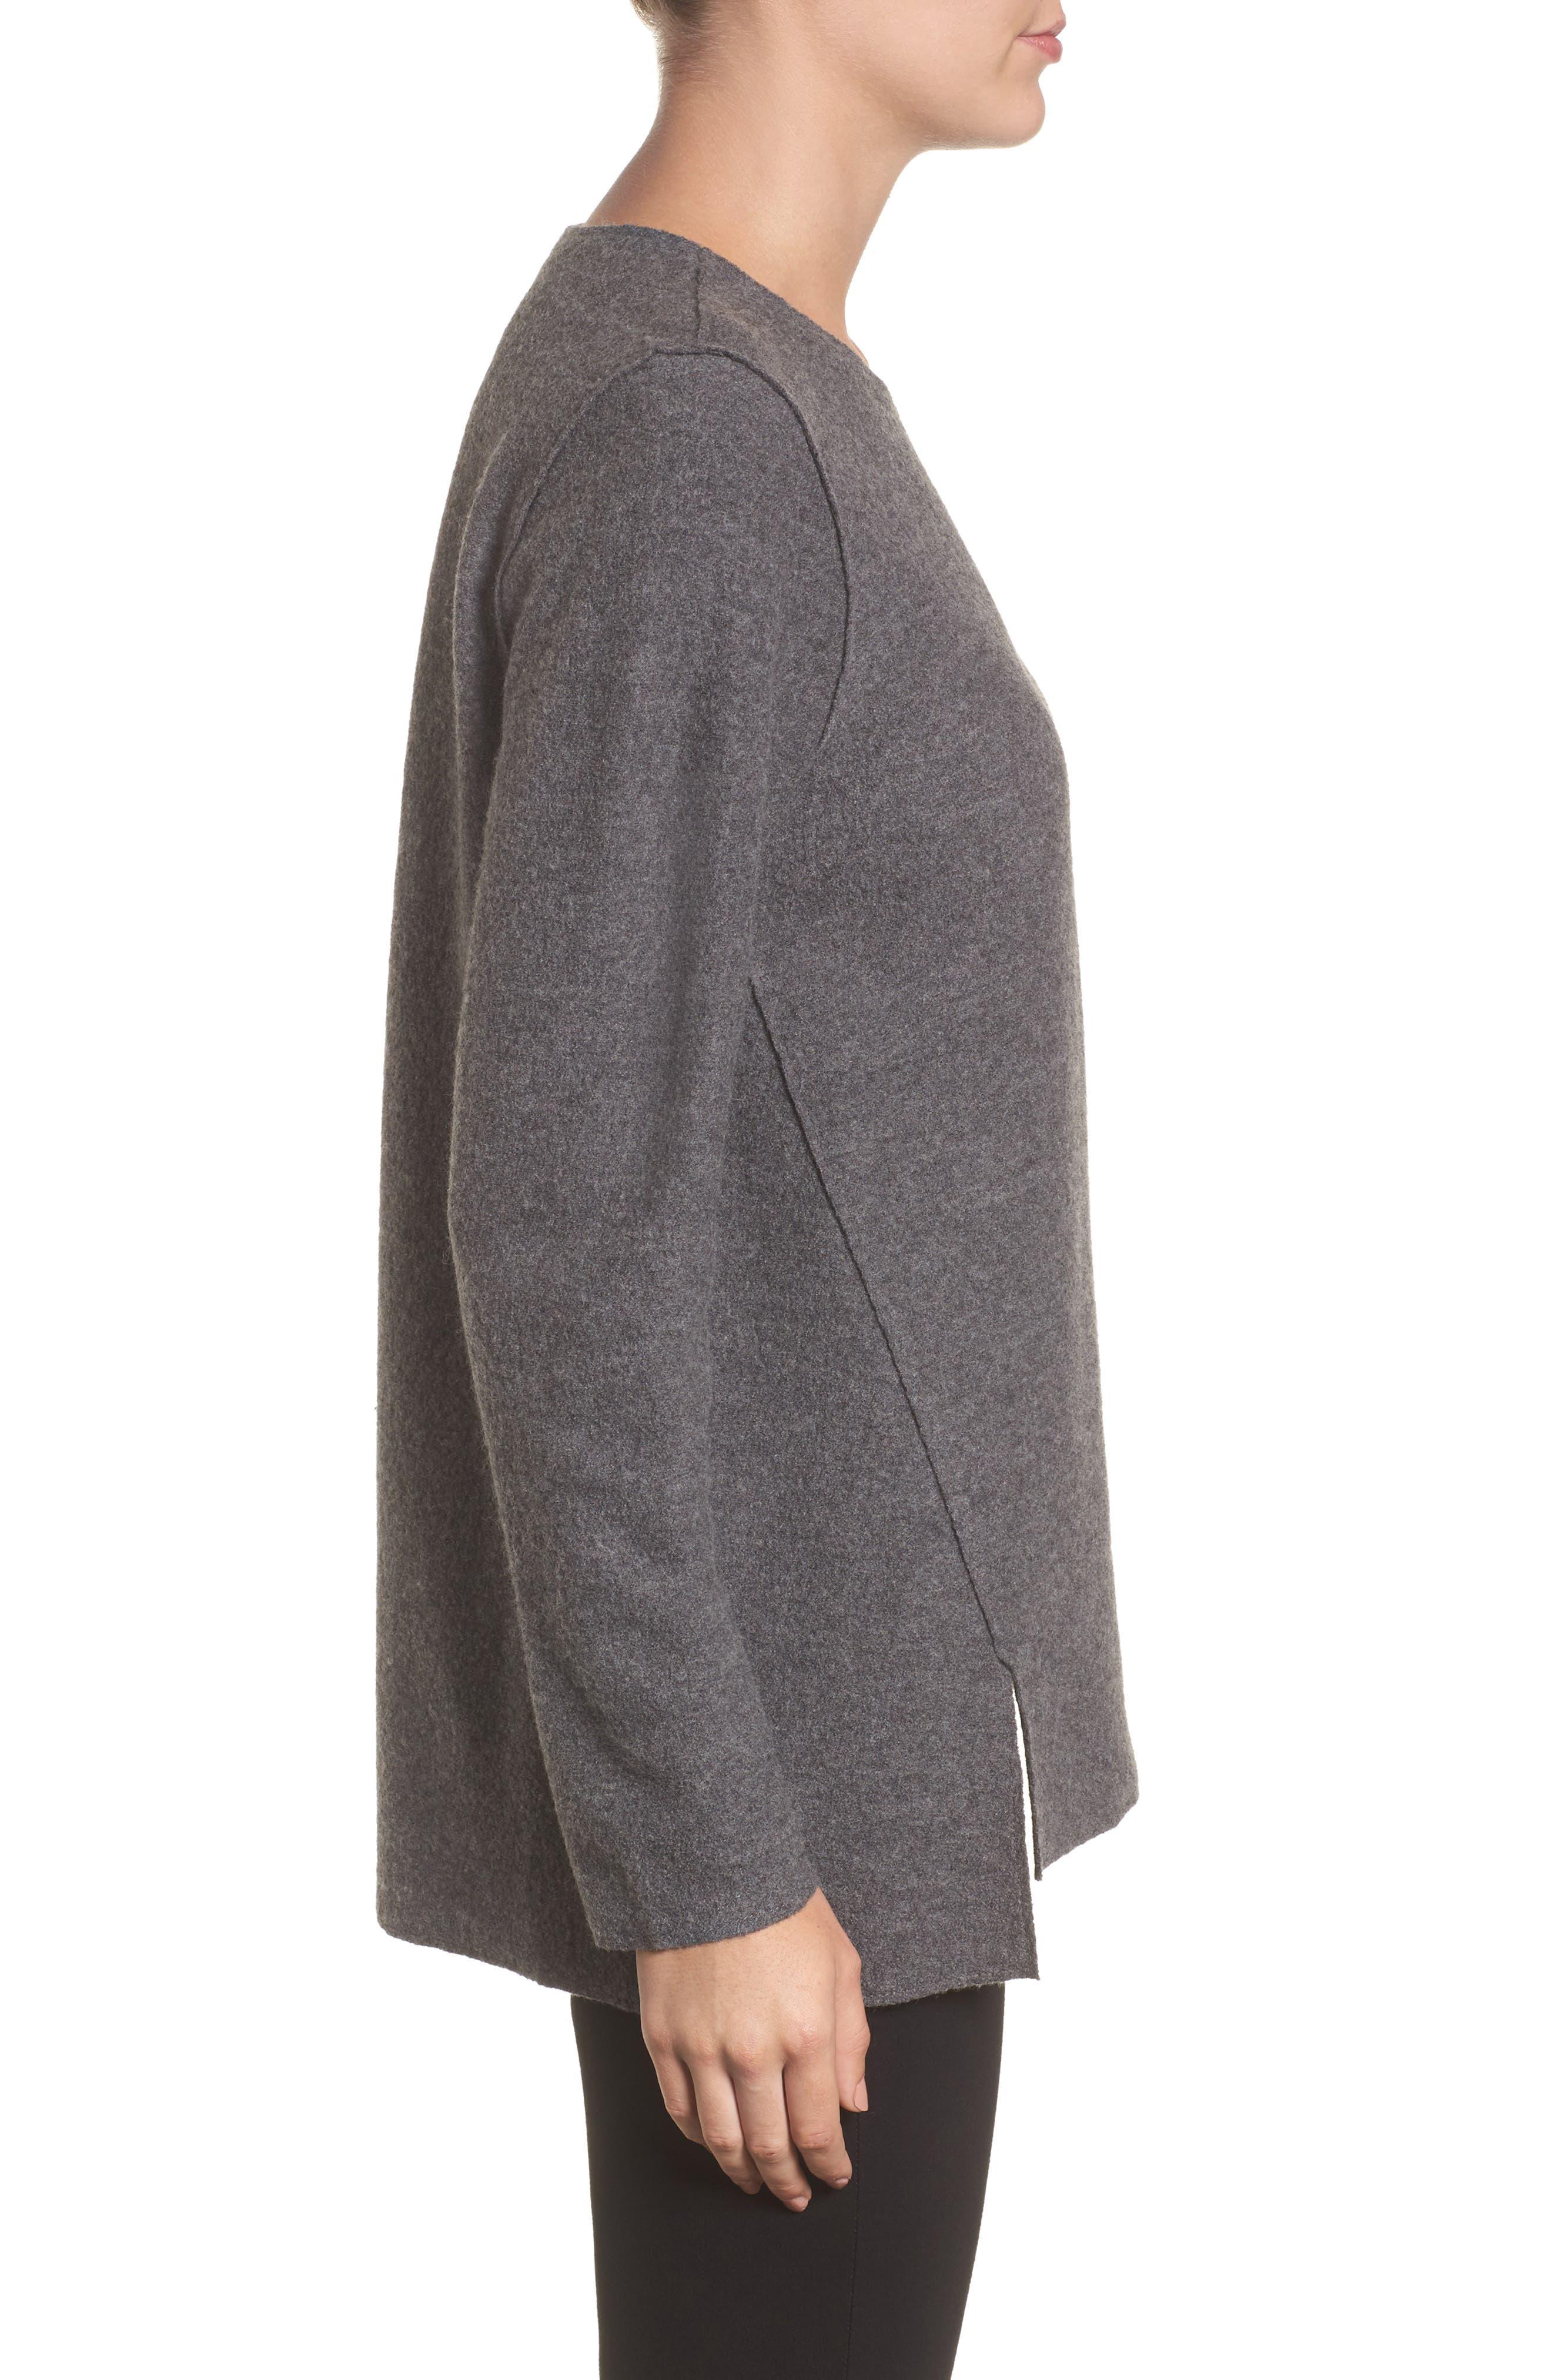 Alternate Image 3  - Eileen Fisher Boiled Merino Wool Top (Regular & Petite)